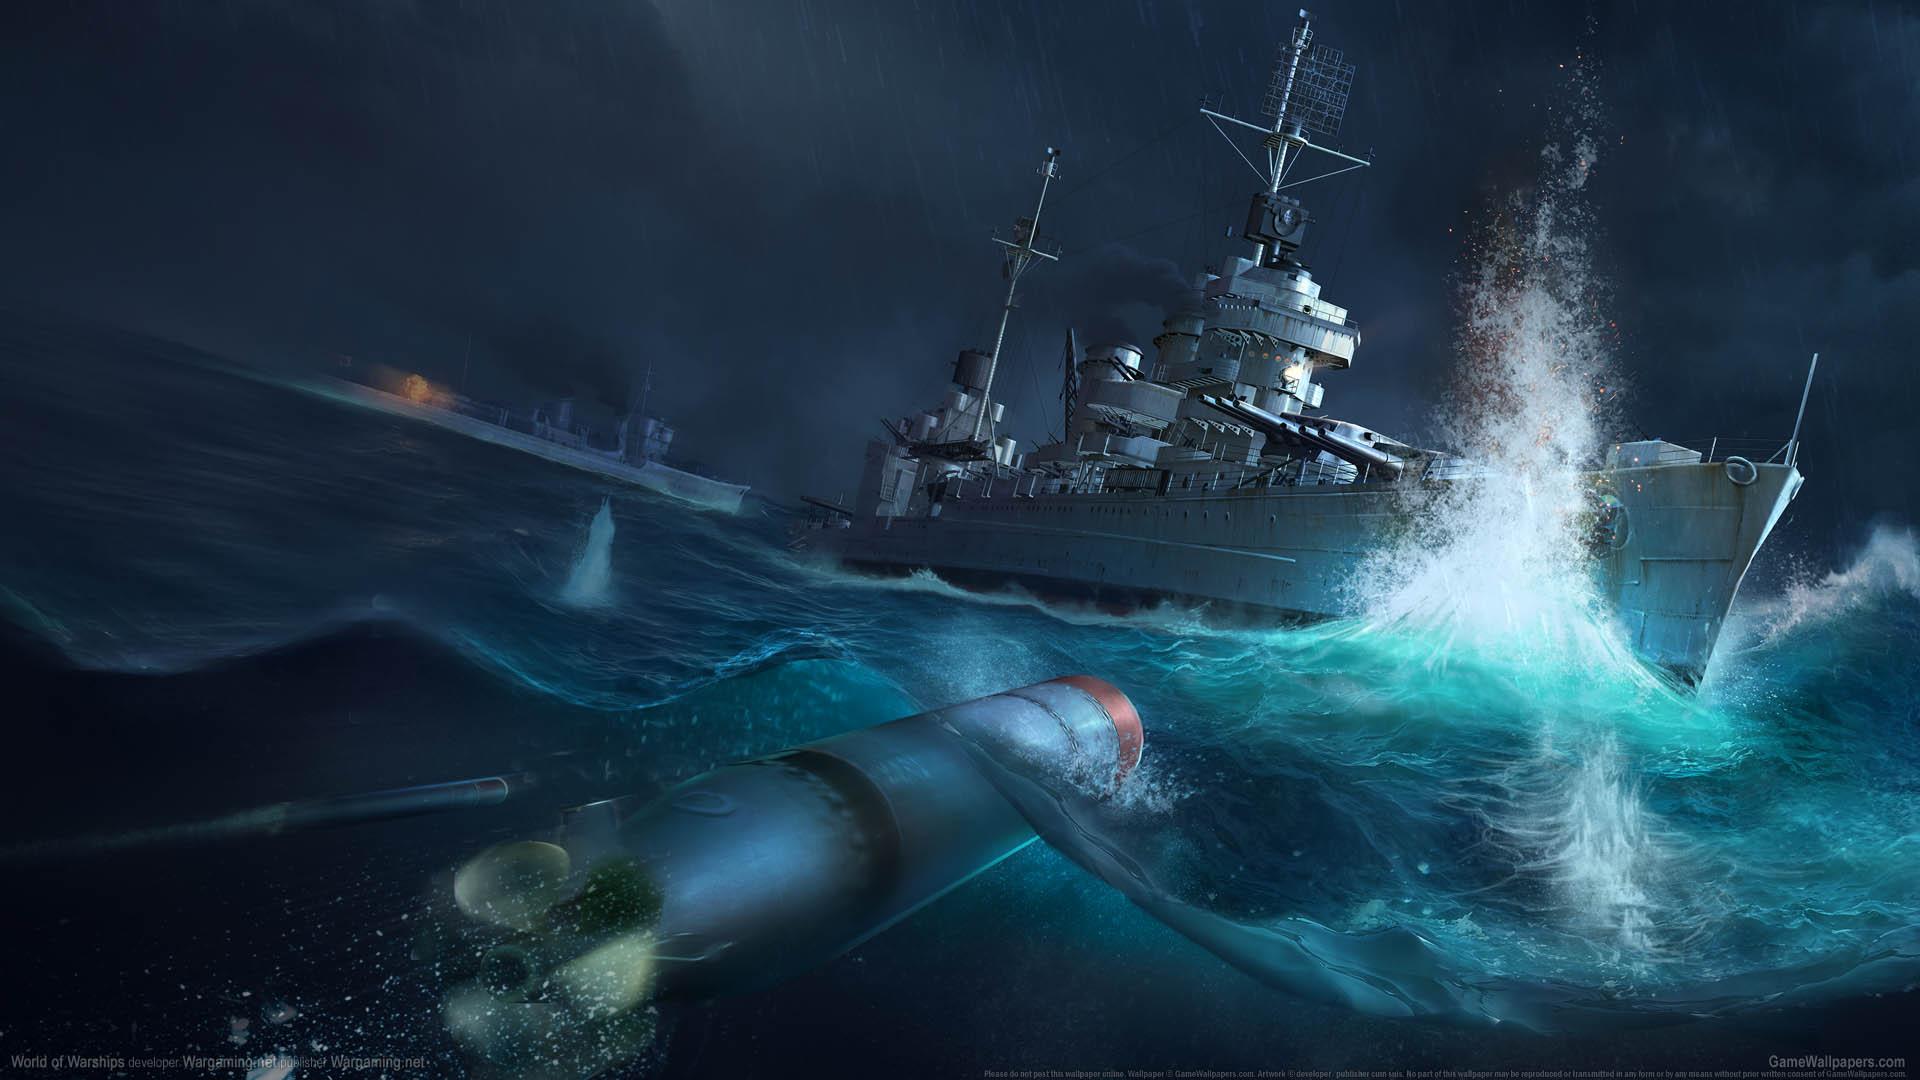 World Of Warships Wallpaper: World Of Warships Wallpaper 12 1920x1080